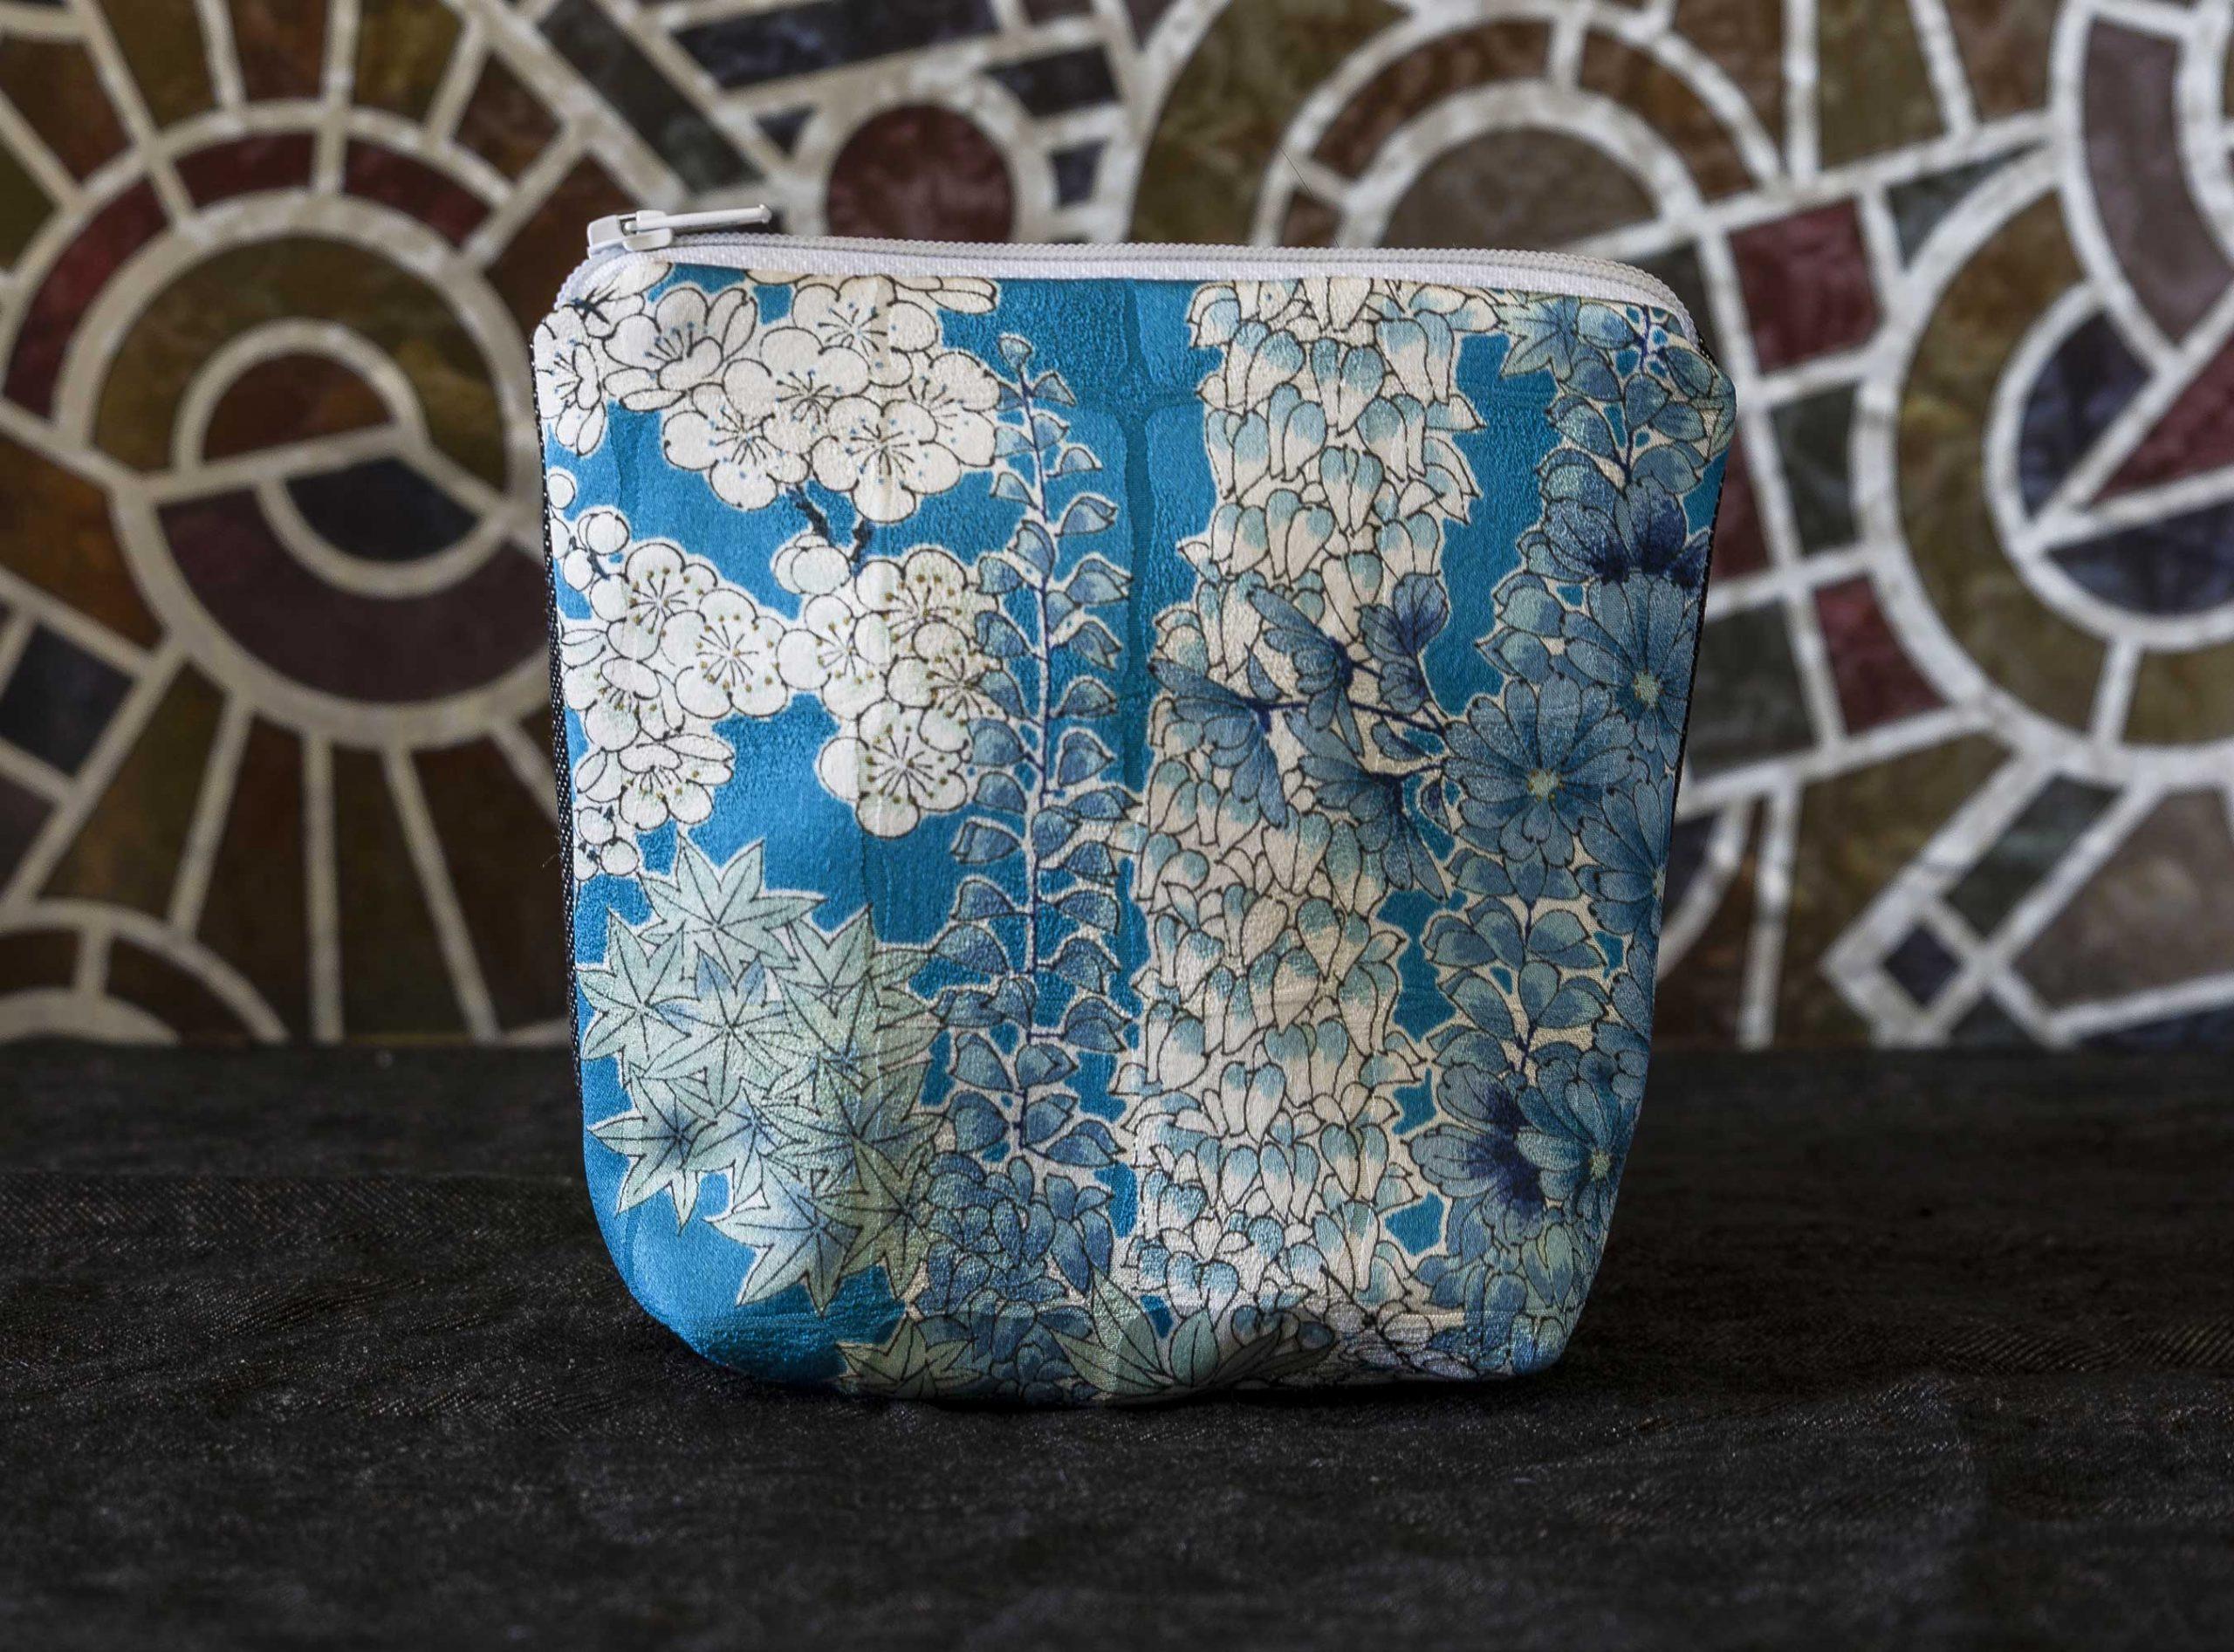 Kiku_pochette_soie_kimono_vintage4121Aweb - fr